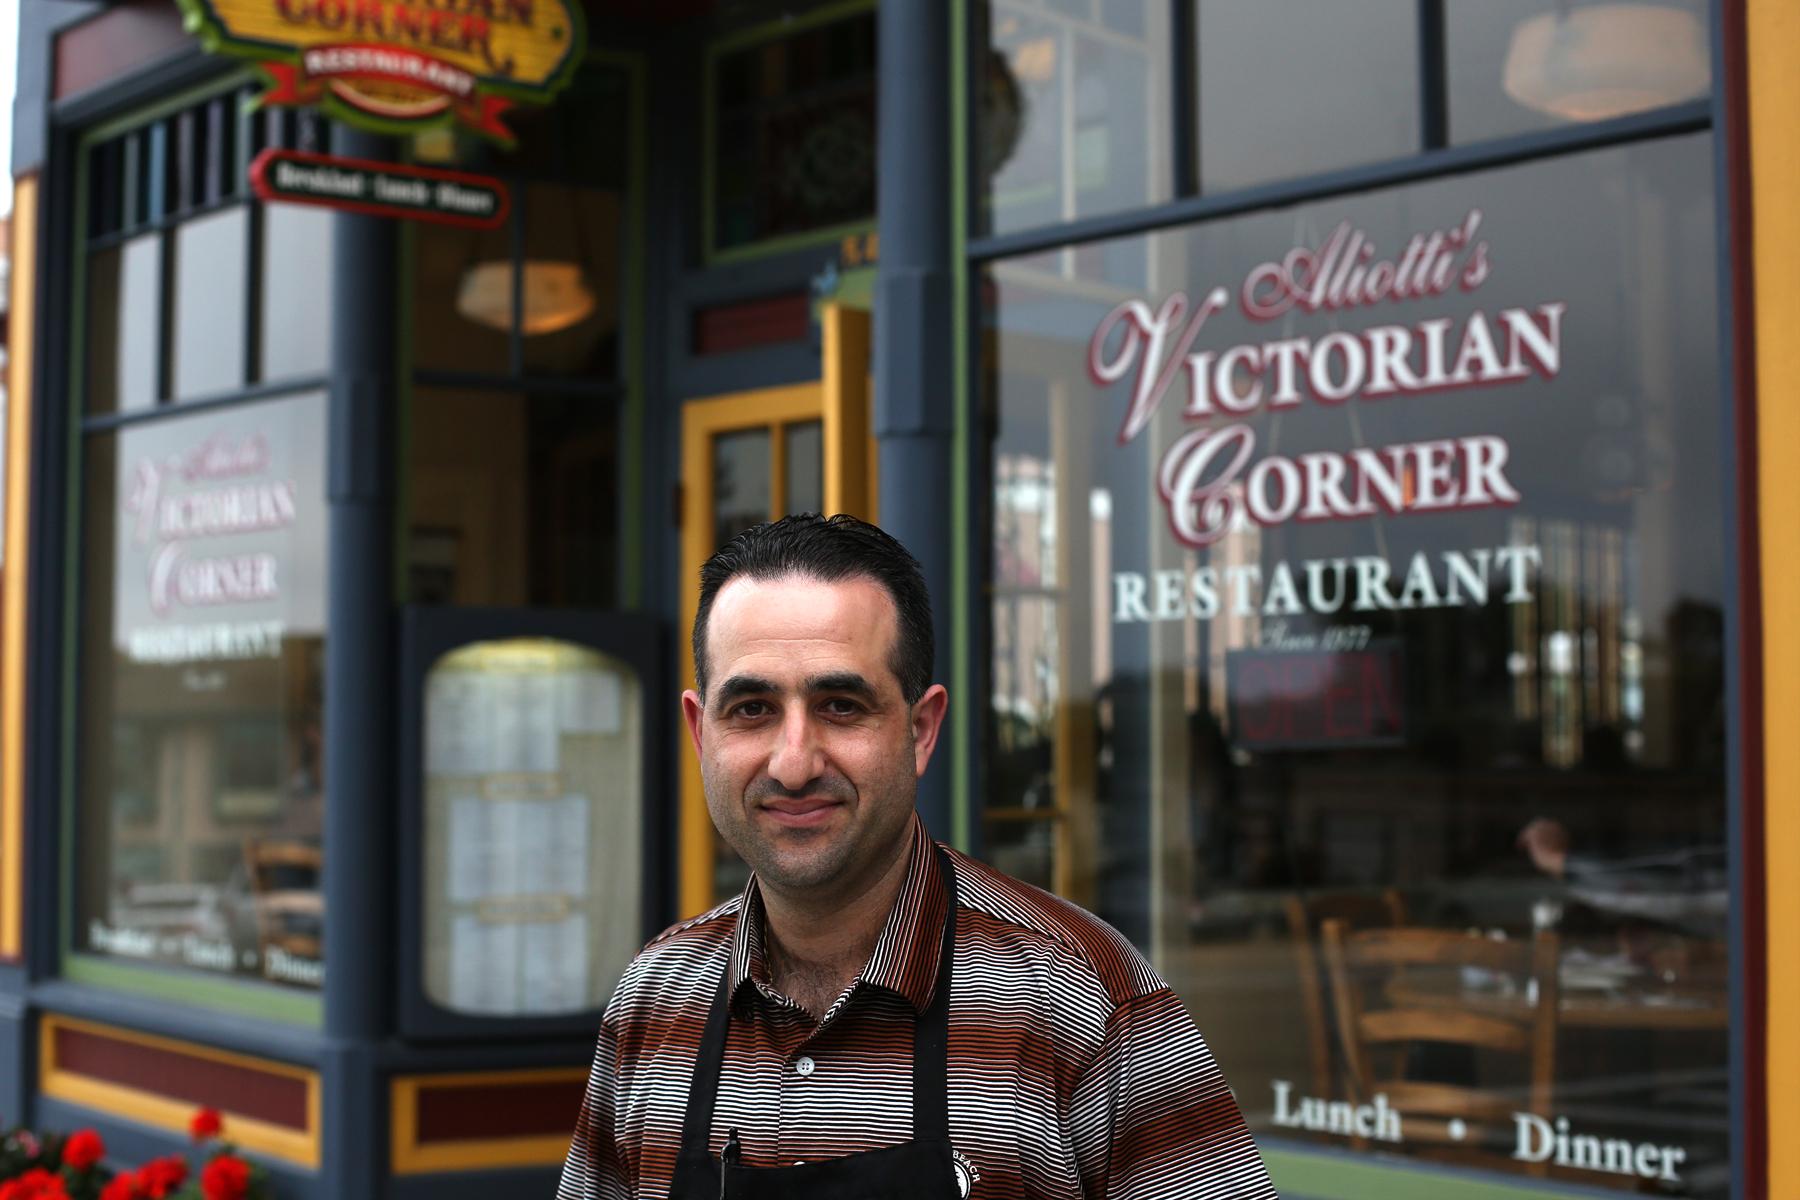 Aliotti's Victorian TCorner Restaurant Indigo Payments Customer